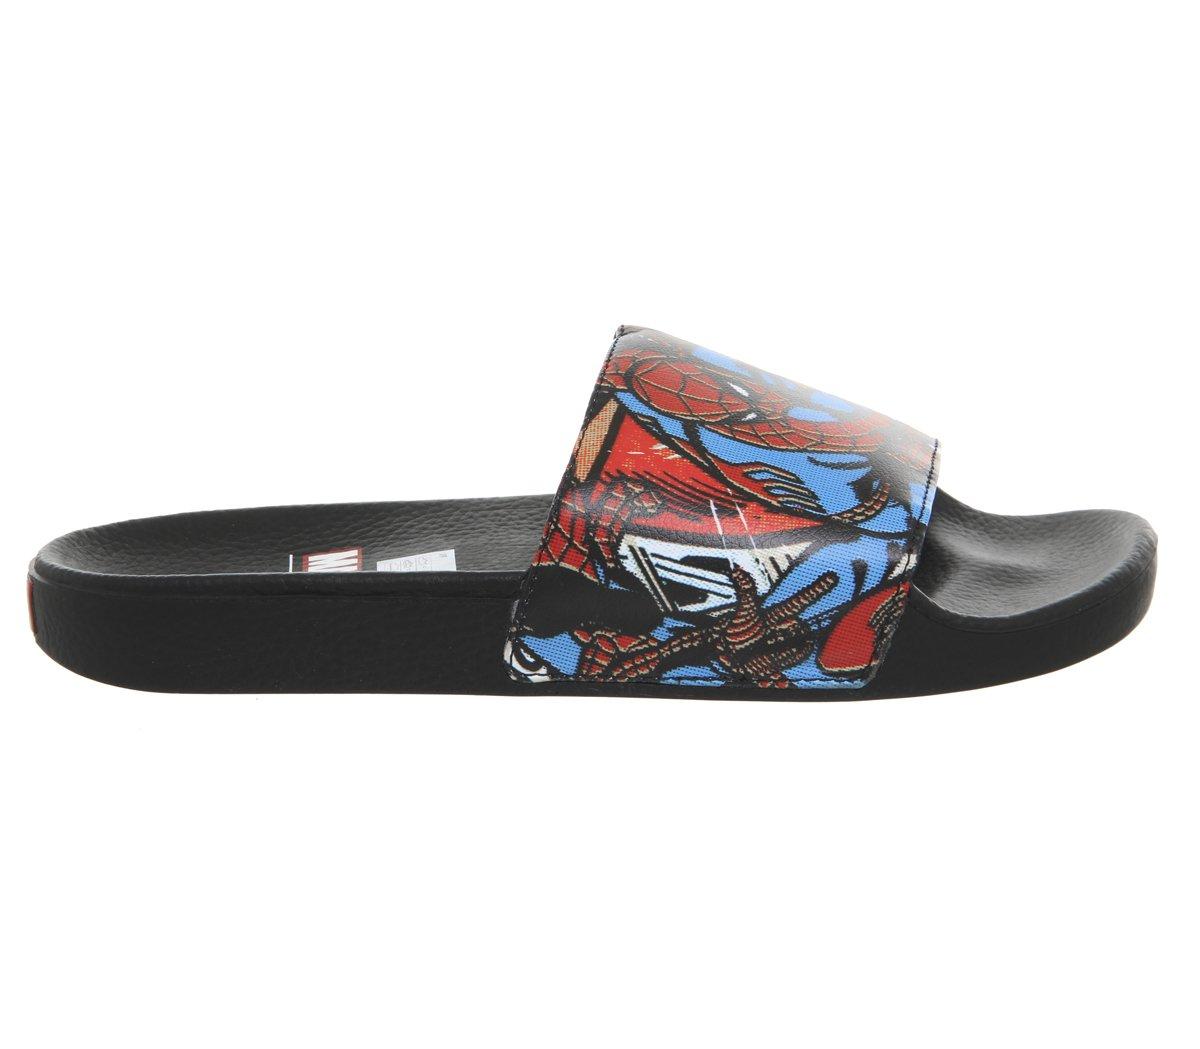 Vans Marvel Spiderman Slide on Sandale Schwarz Schwarz